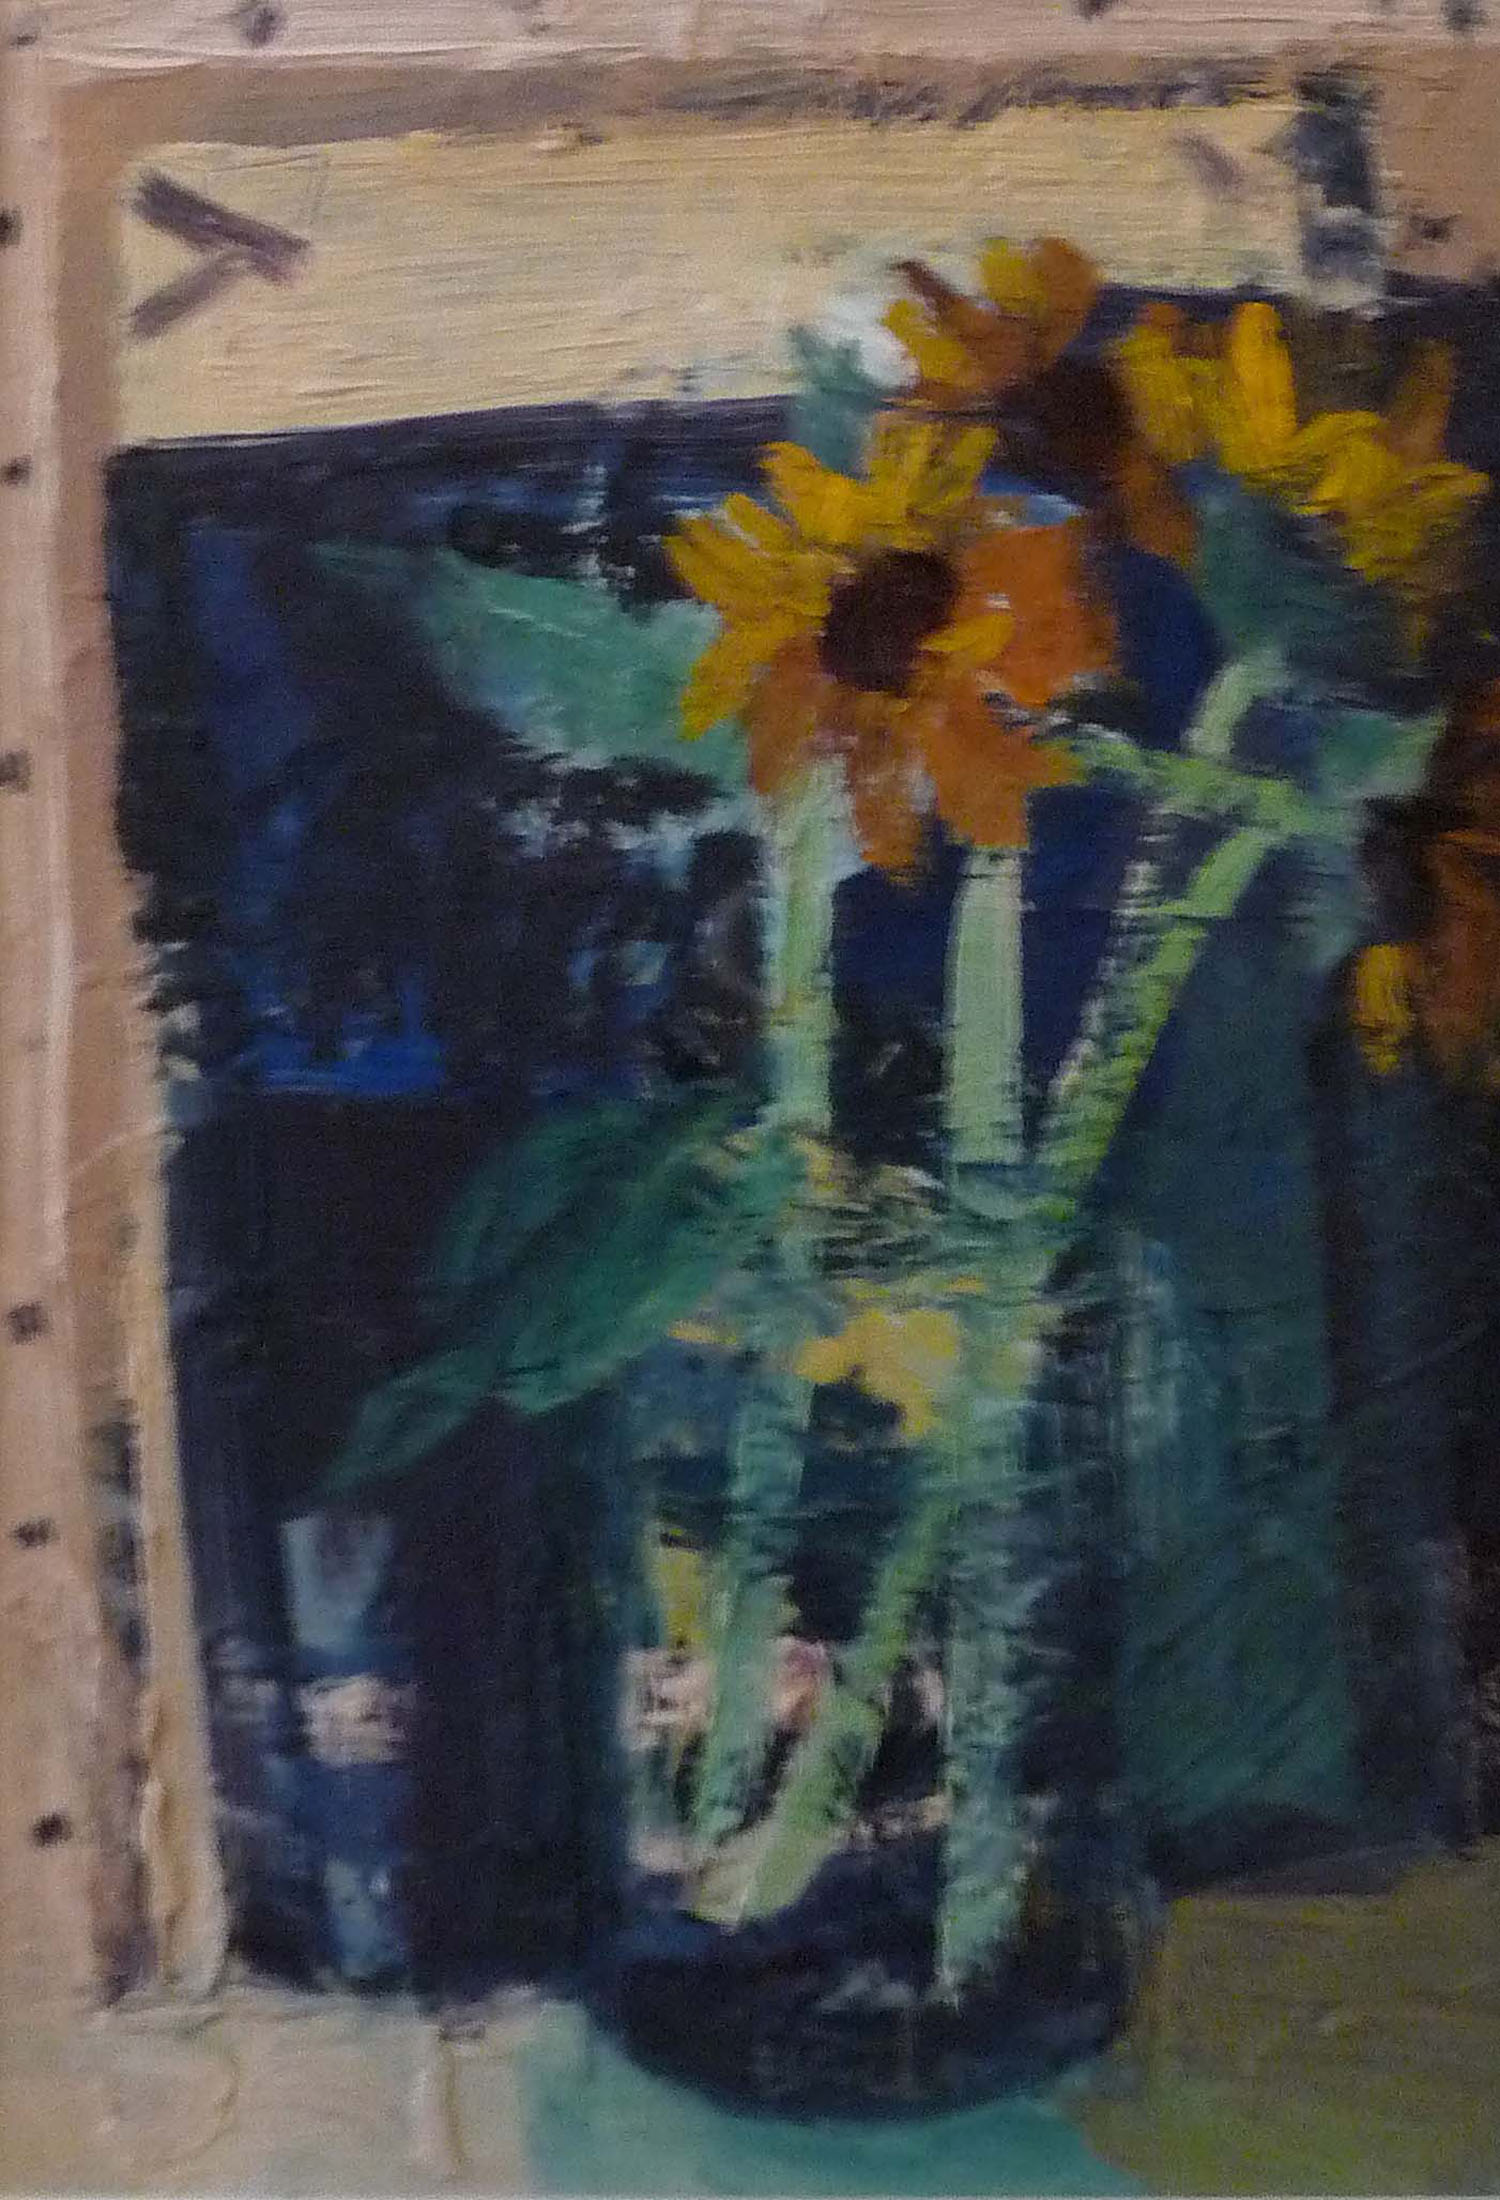 Brian Ballard_-_Four Sunflowers_36 x 26cm.jpg